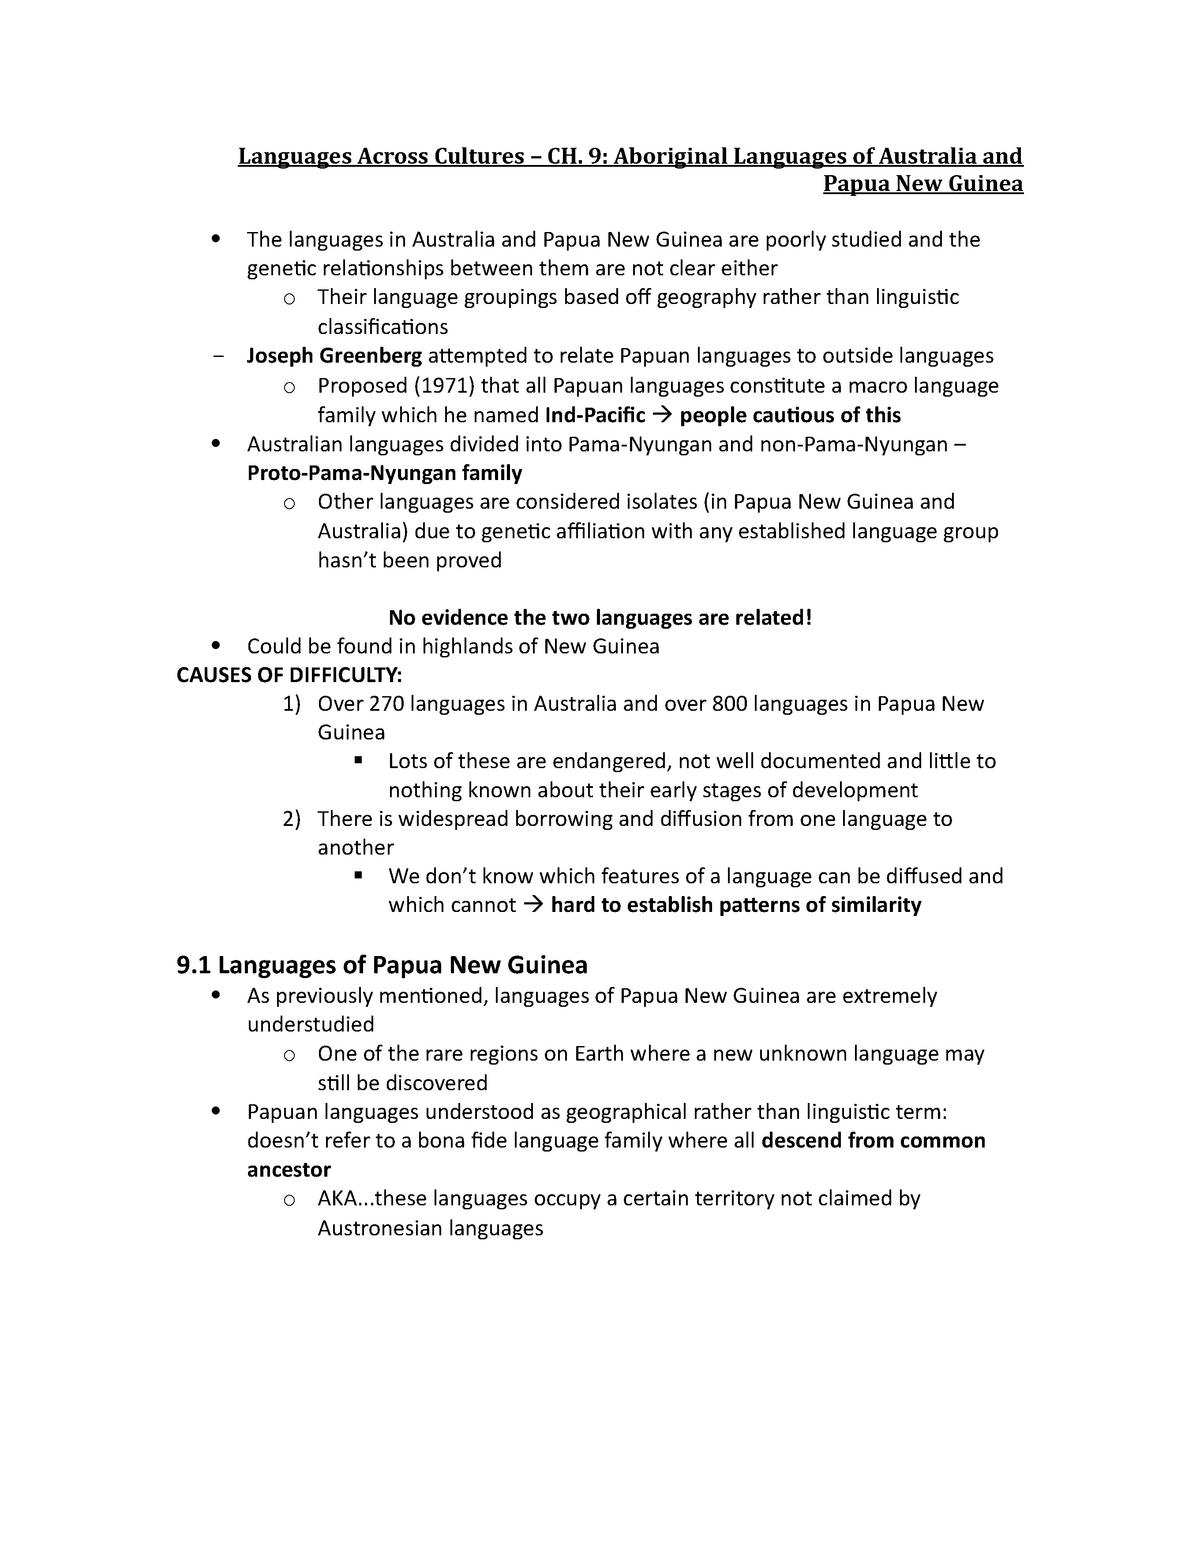 CH  9 - Australian & Papua New Guinea languages - ANTH 1203